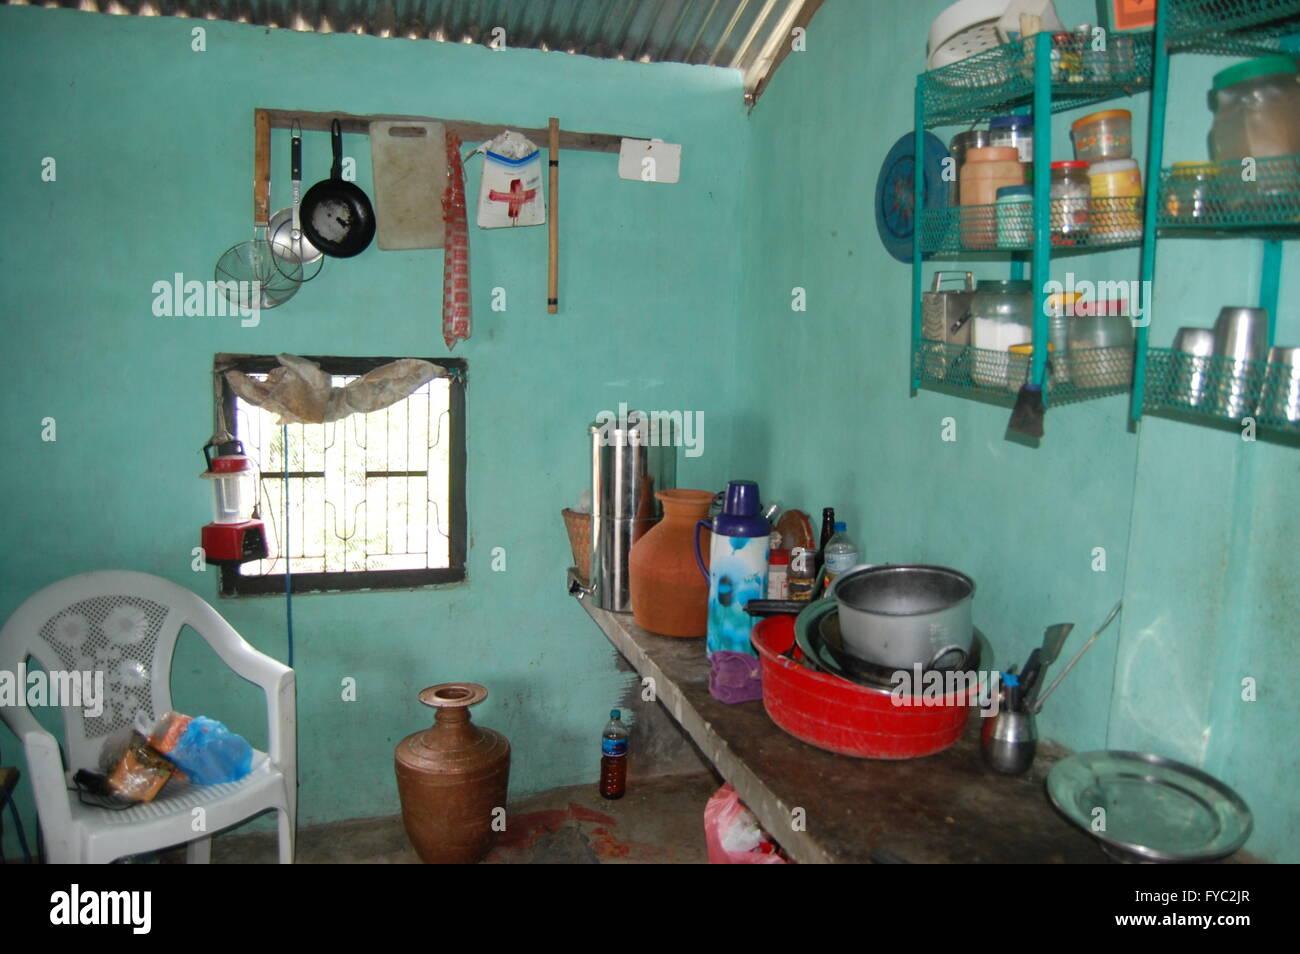 Poor Kitchen Stock Photos & Poor Kitchen Stock Images - Alamy